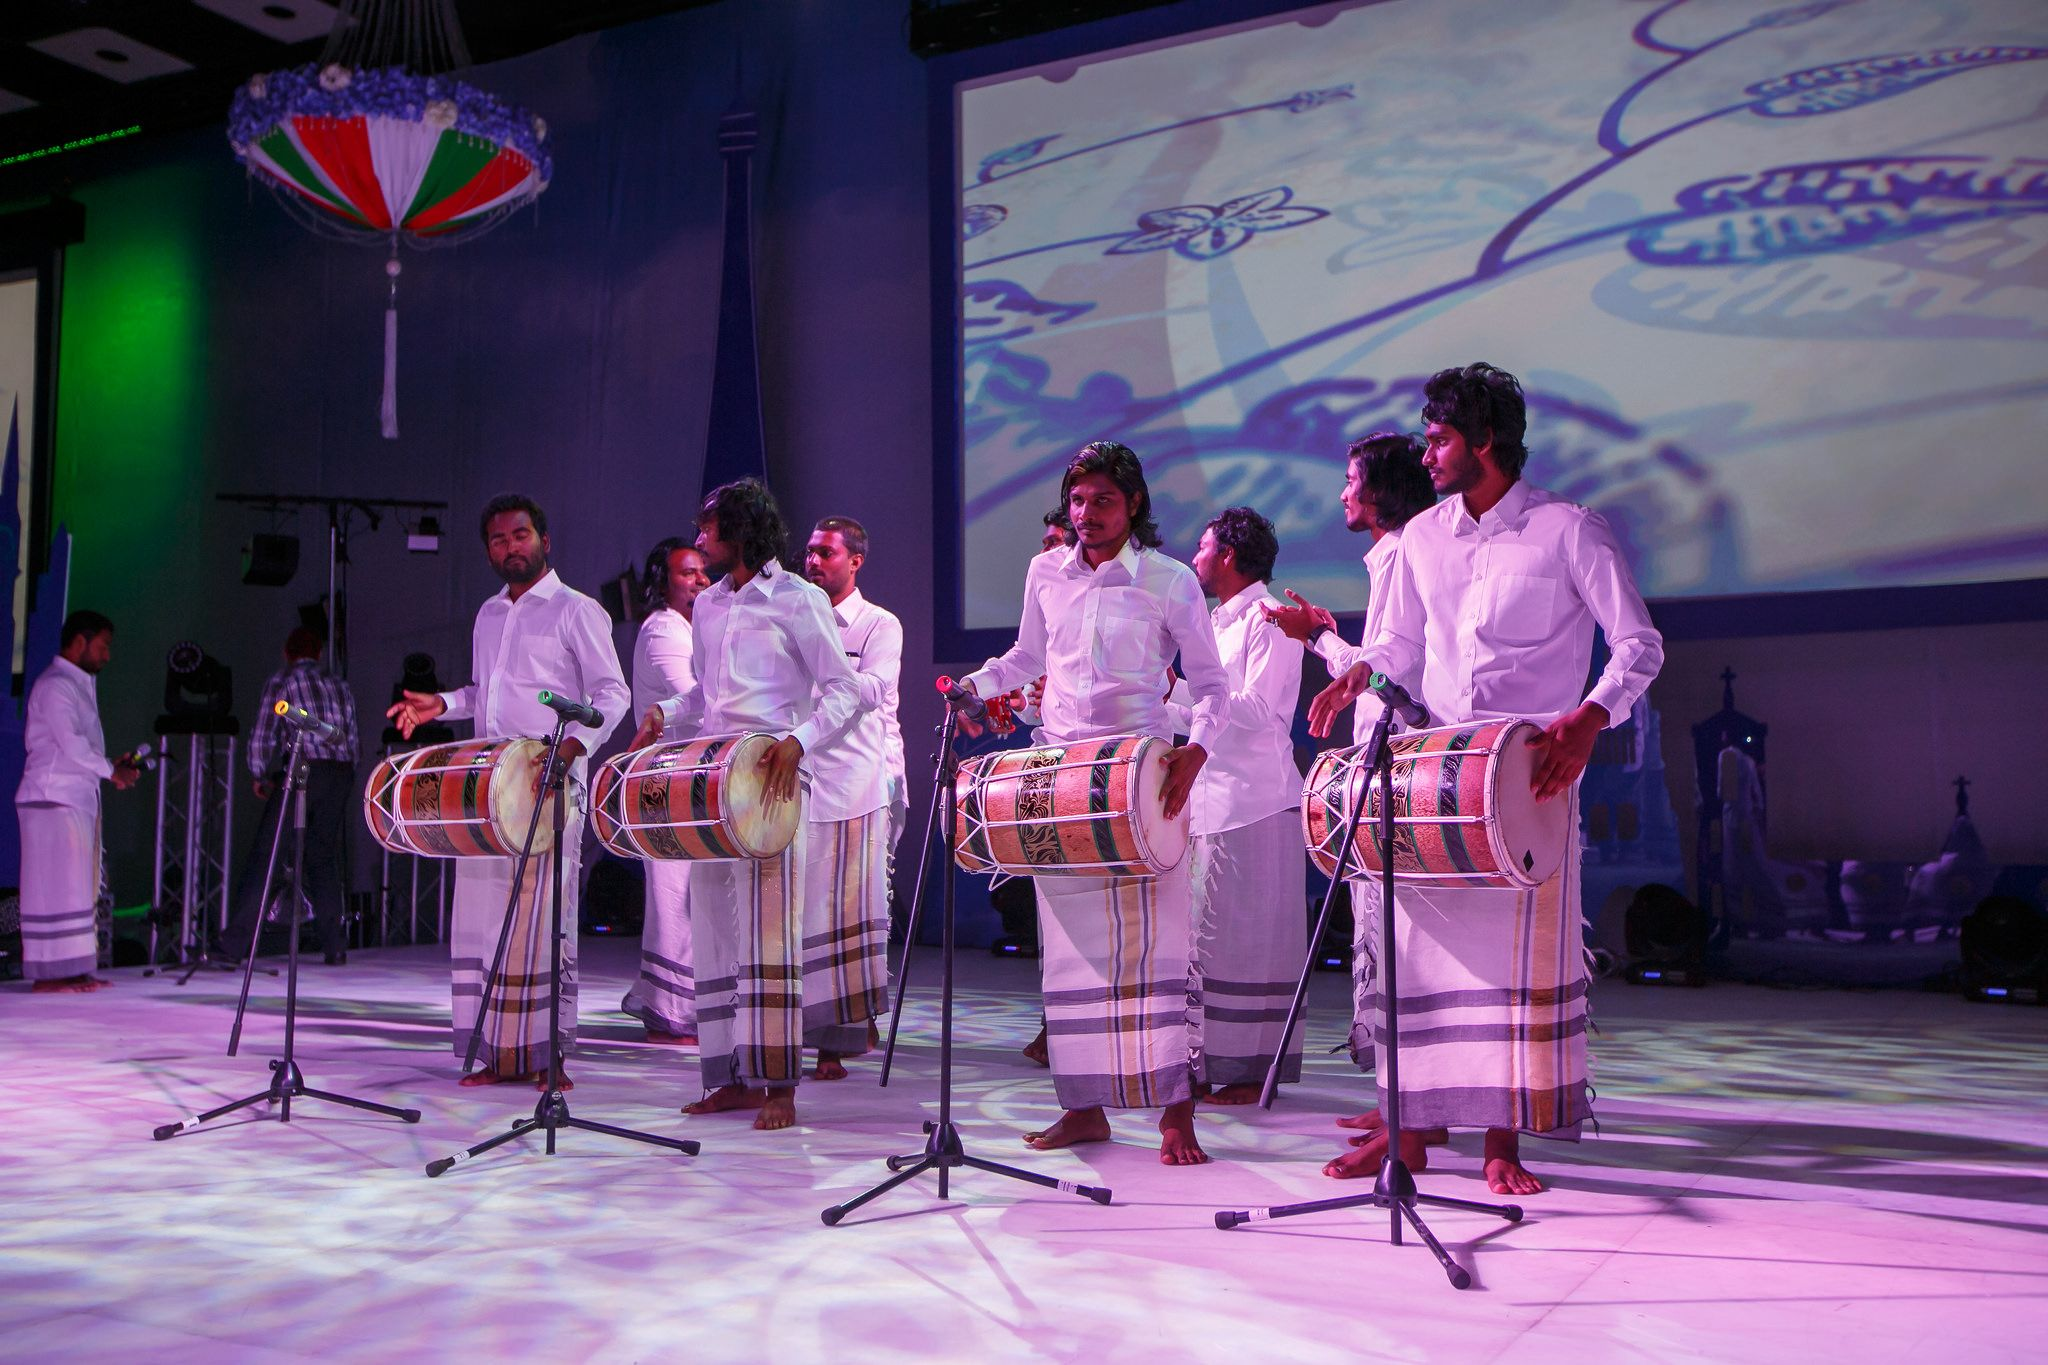 Maldives themed wedding, Maldives' musicians